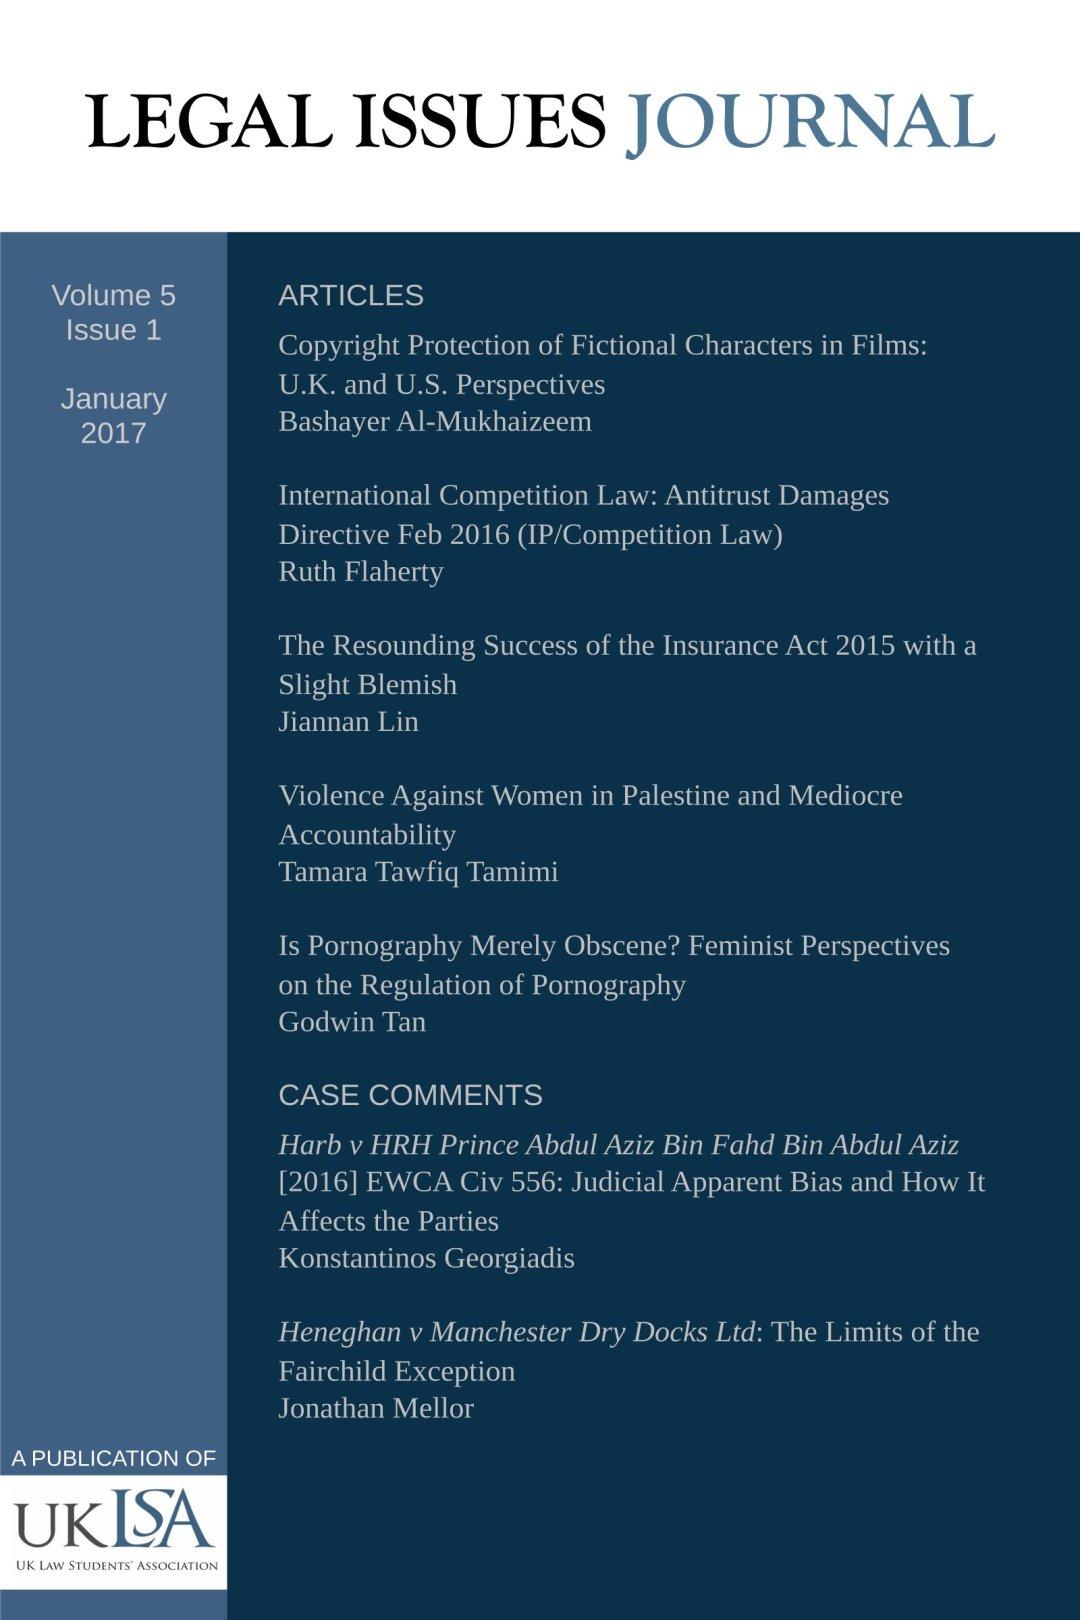 Issue 5(1) – Jan 2017